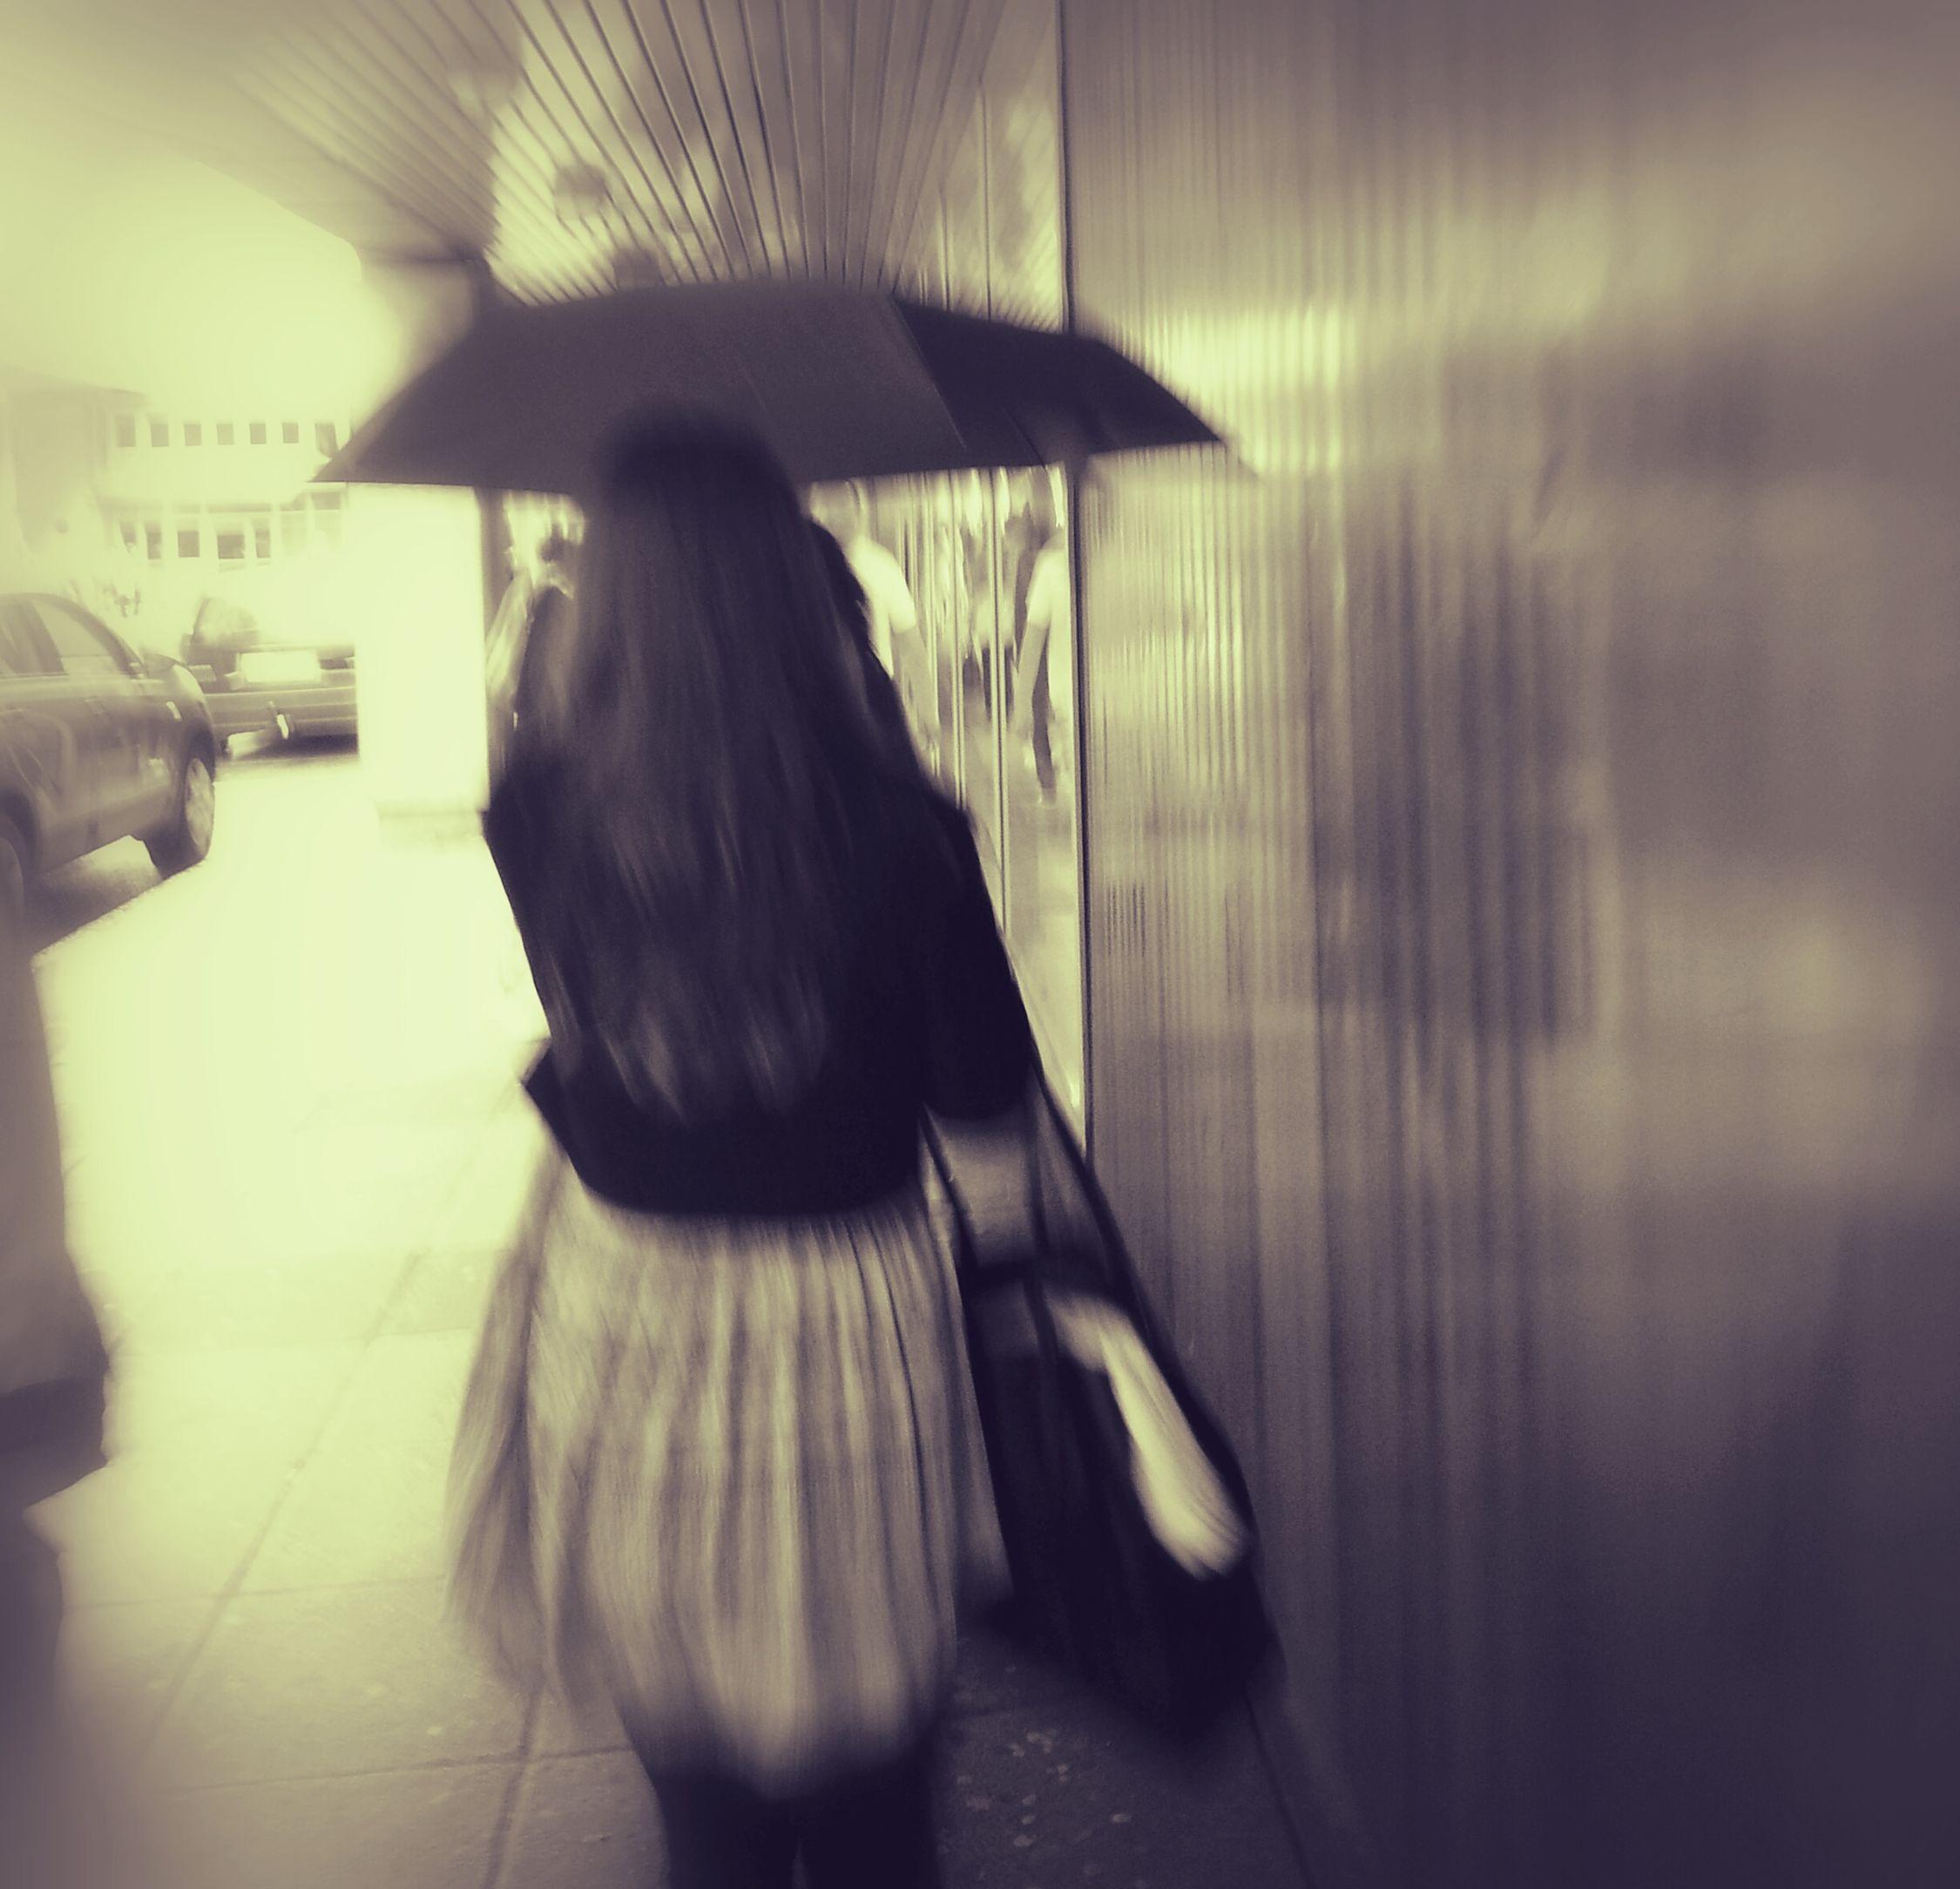 Streetphotography Street Life Summer Girls Streetphotos Under My Umbrella